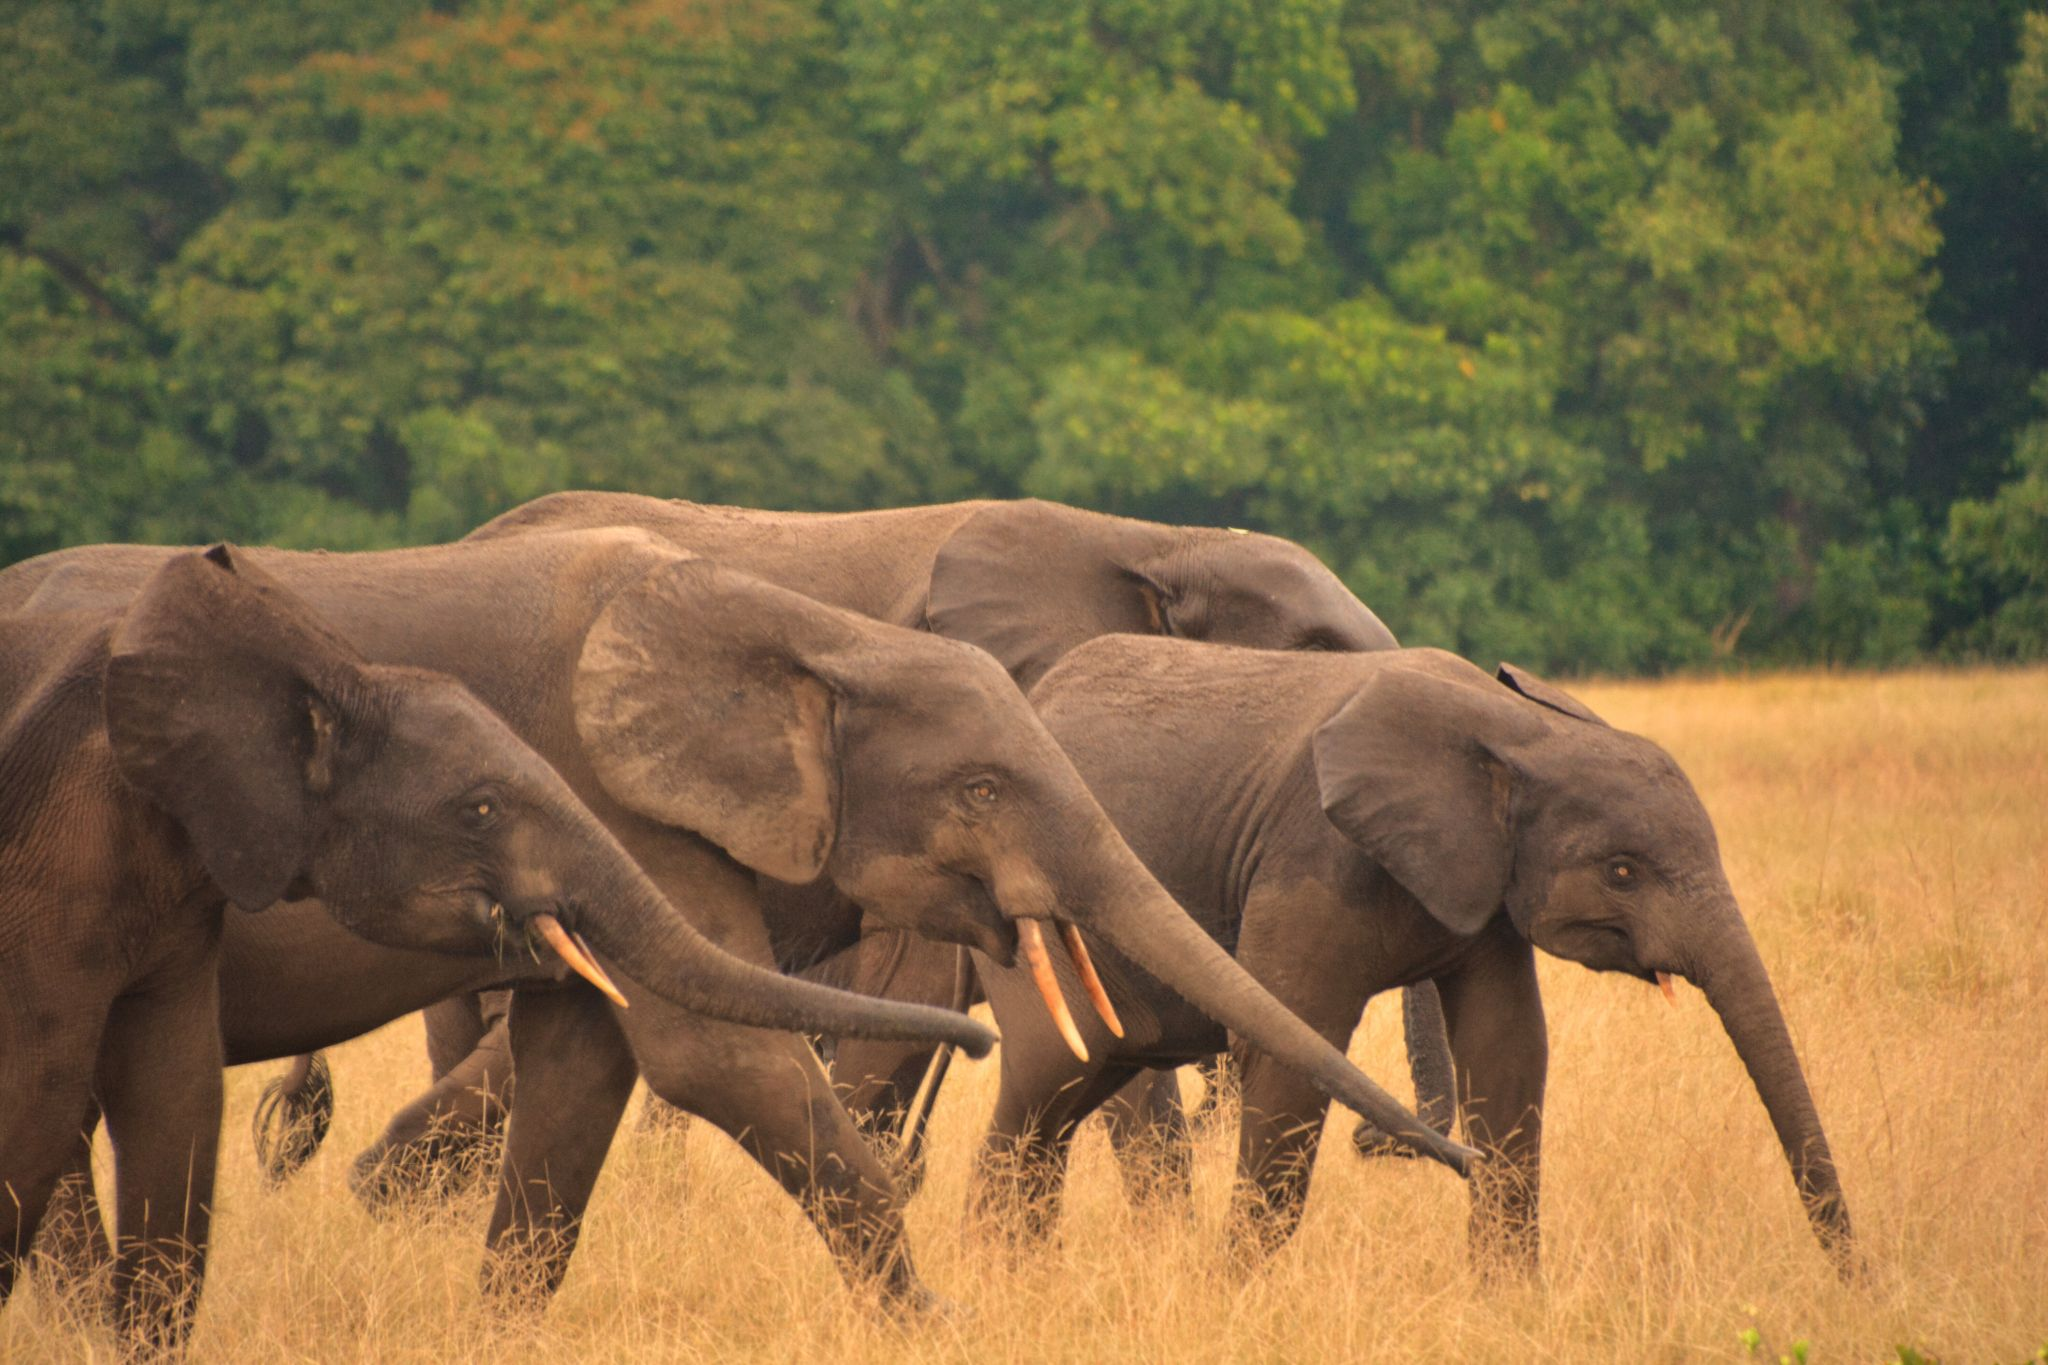 'Pygmy' Forest Elephants at Loango National Park, Gabon